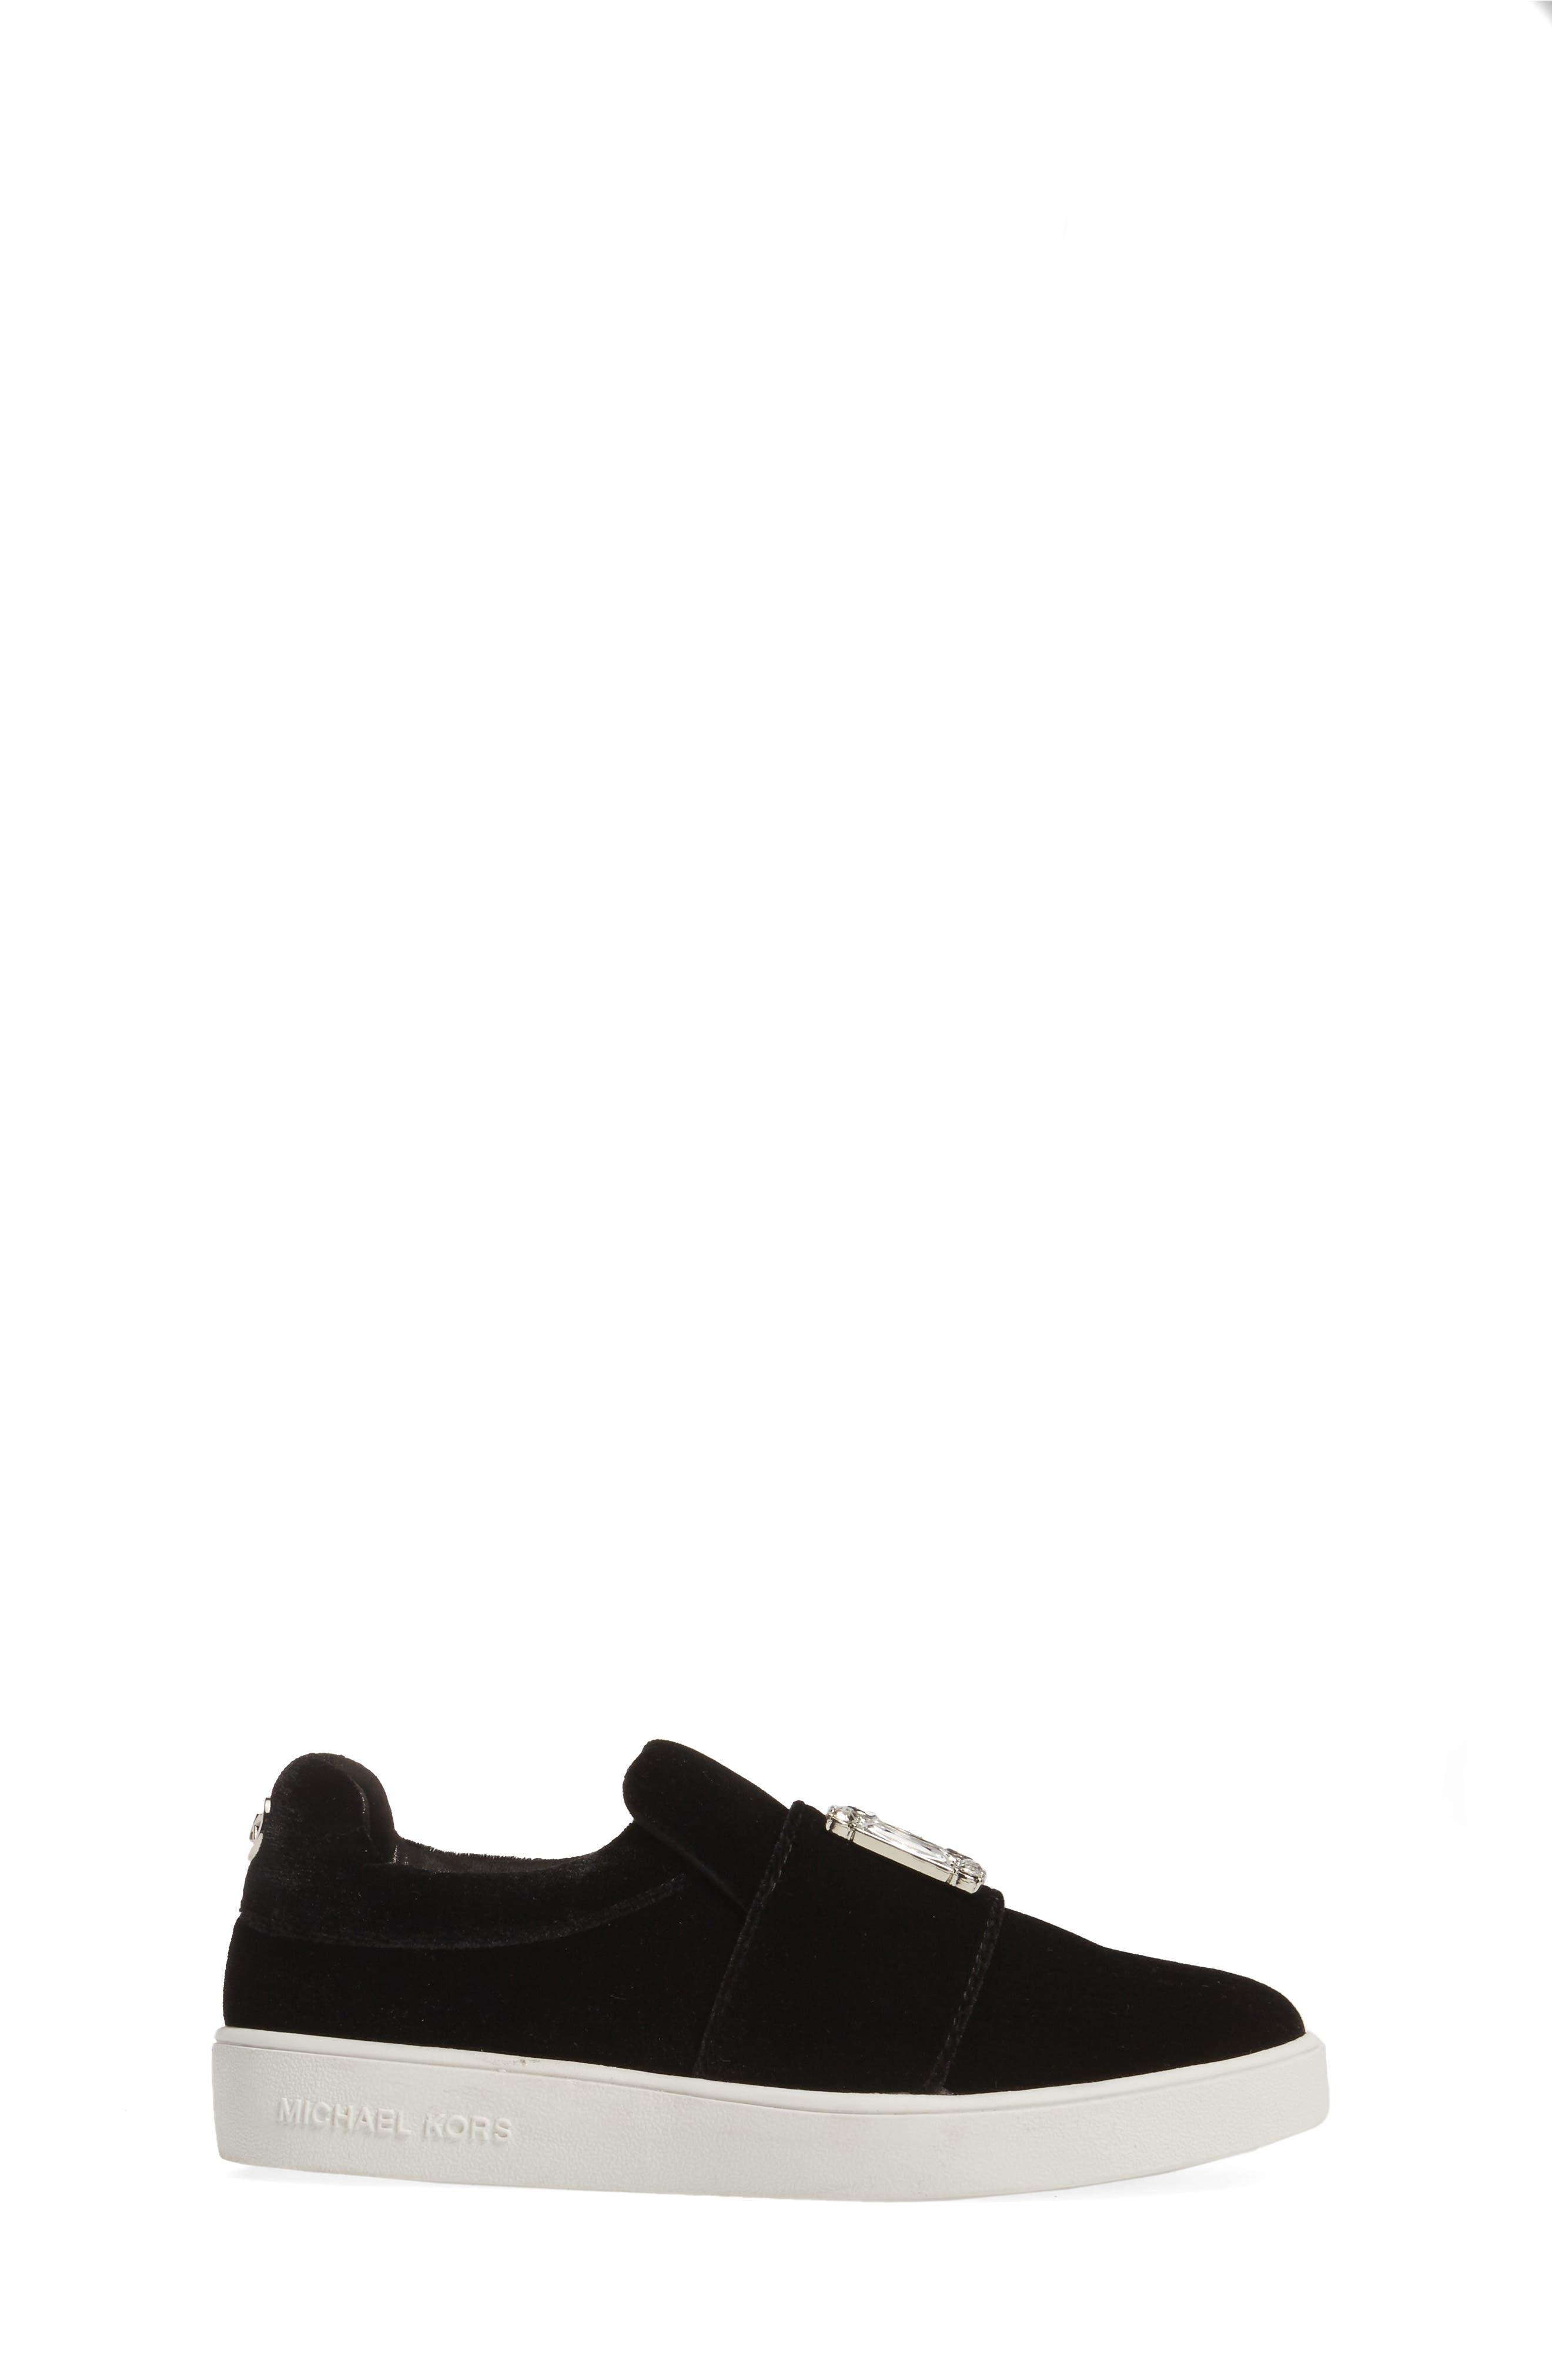 Ivy Dream Embellished Slip-On Sneaker,                             Alternate thumbnail 3, color,                             Black